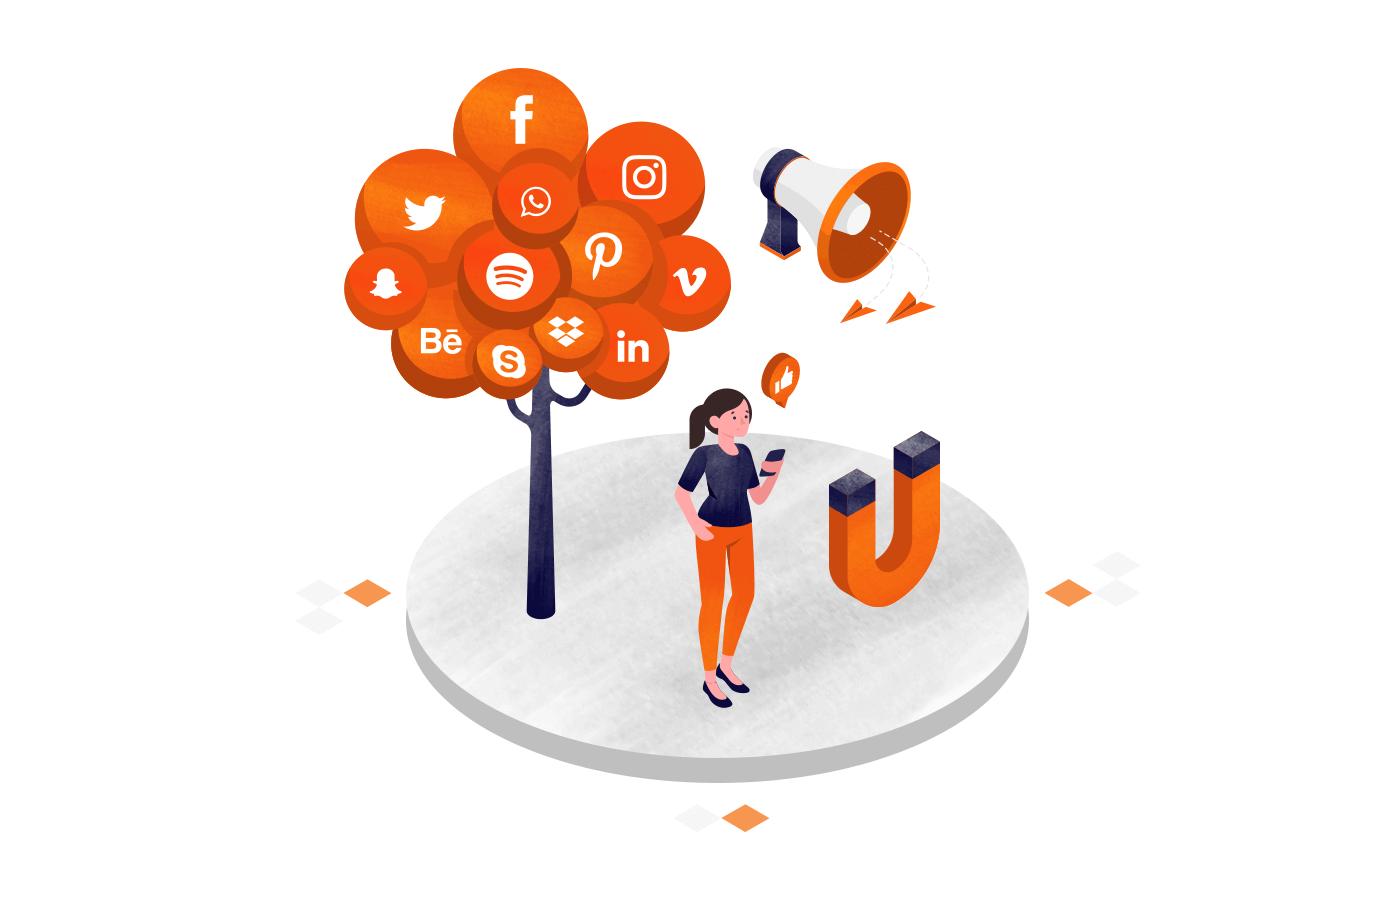 lead_generation_through_social_media